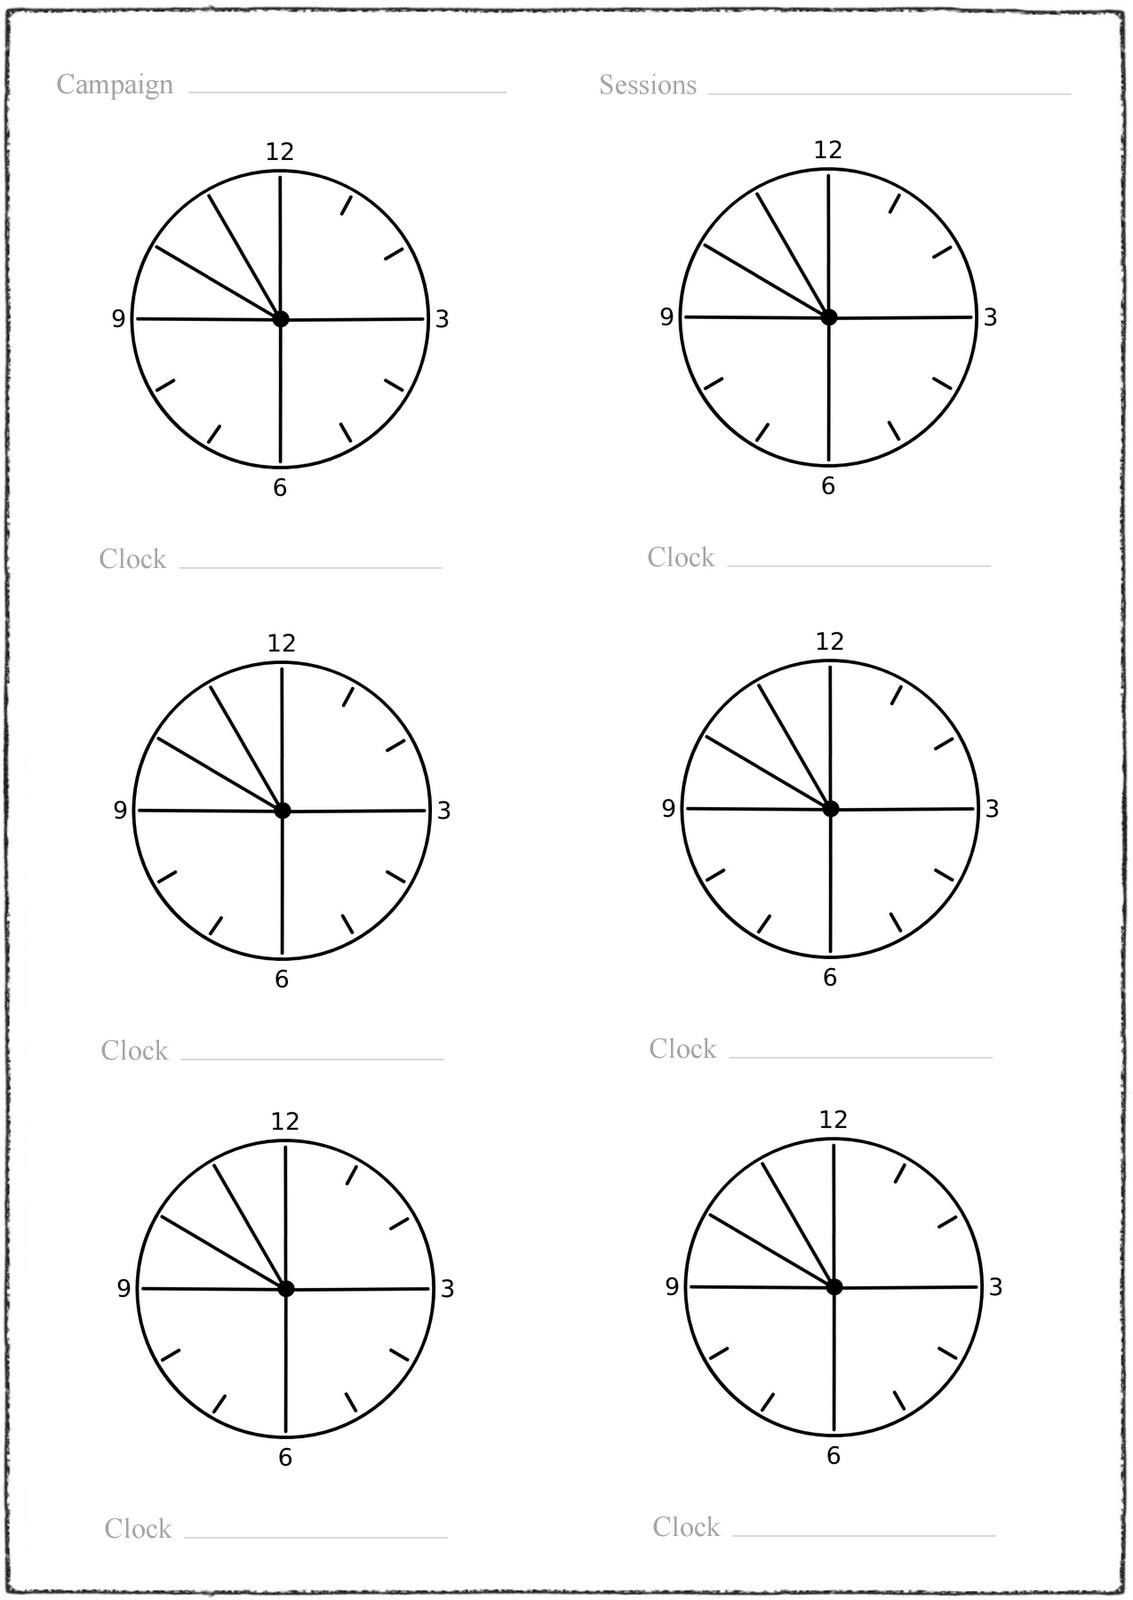 telecanter u0026 39 s receding rules  countdown clock record sheets